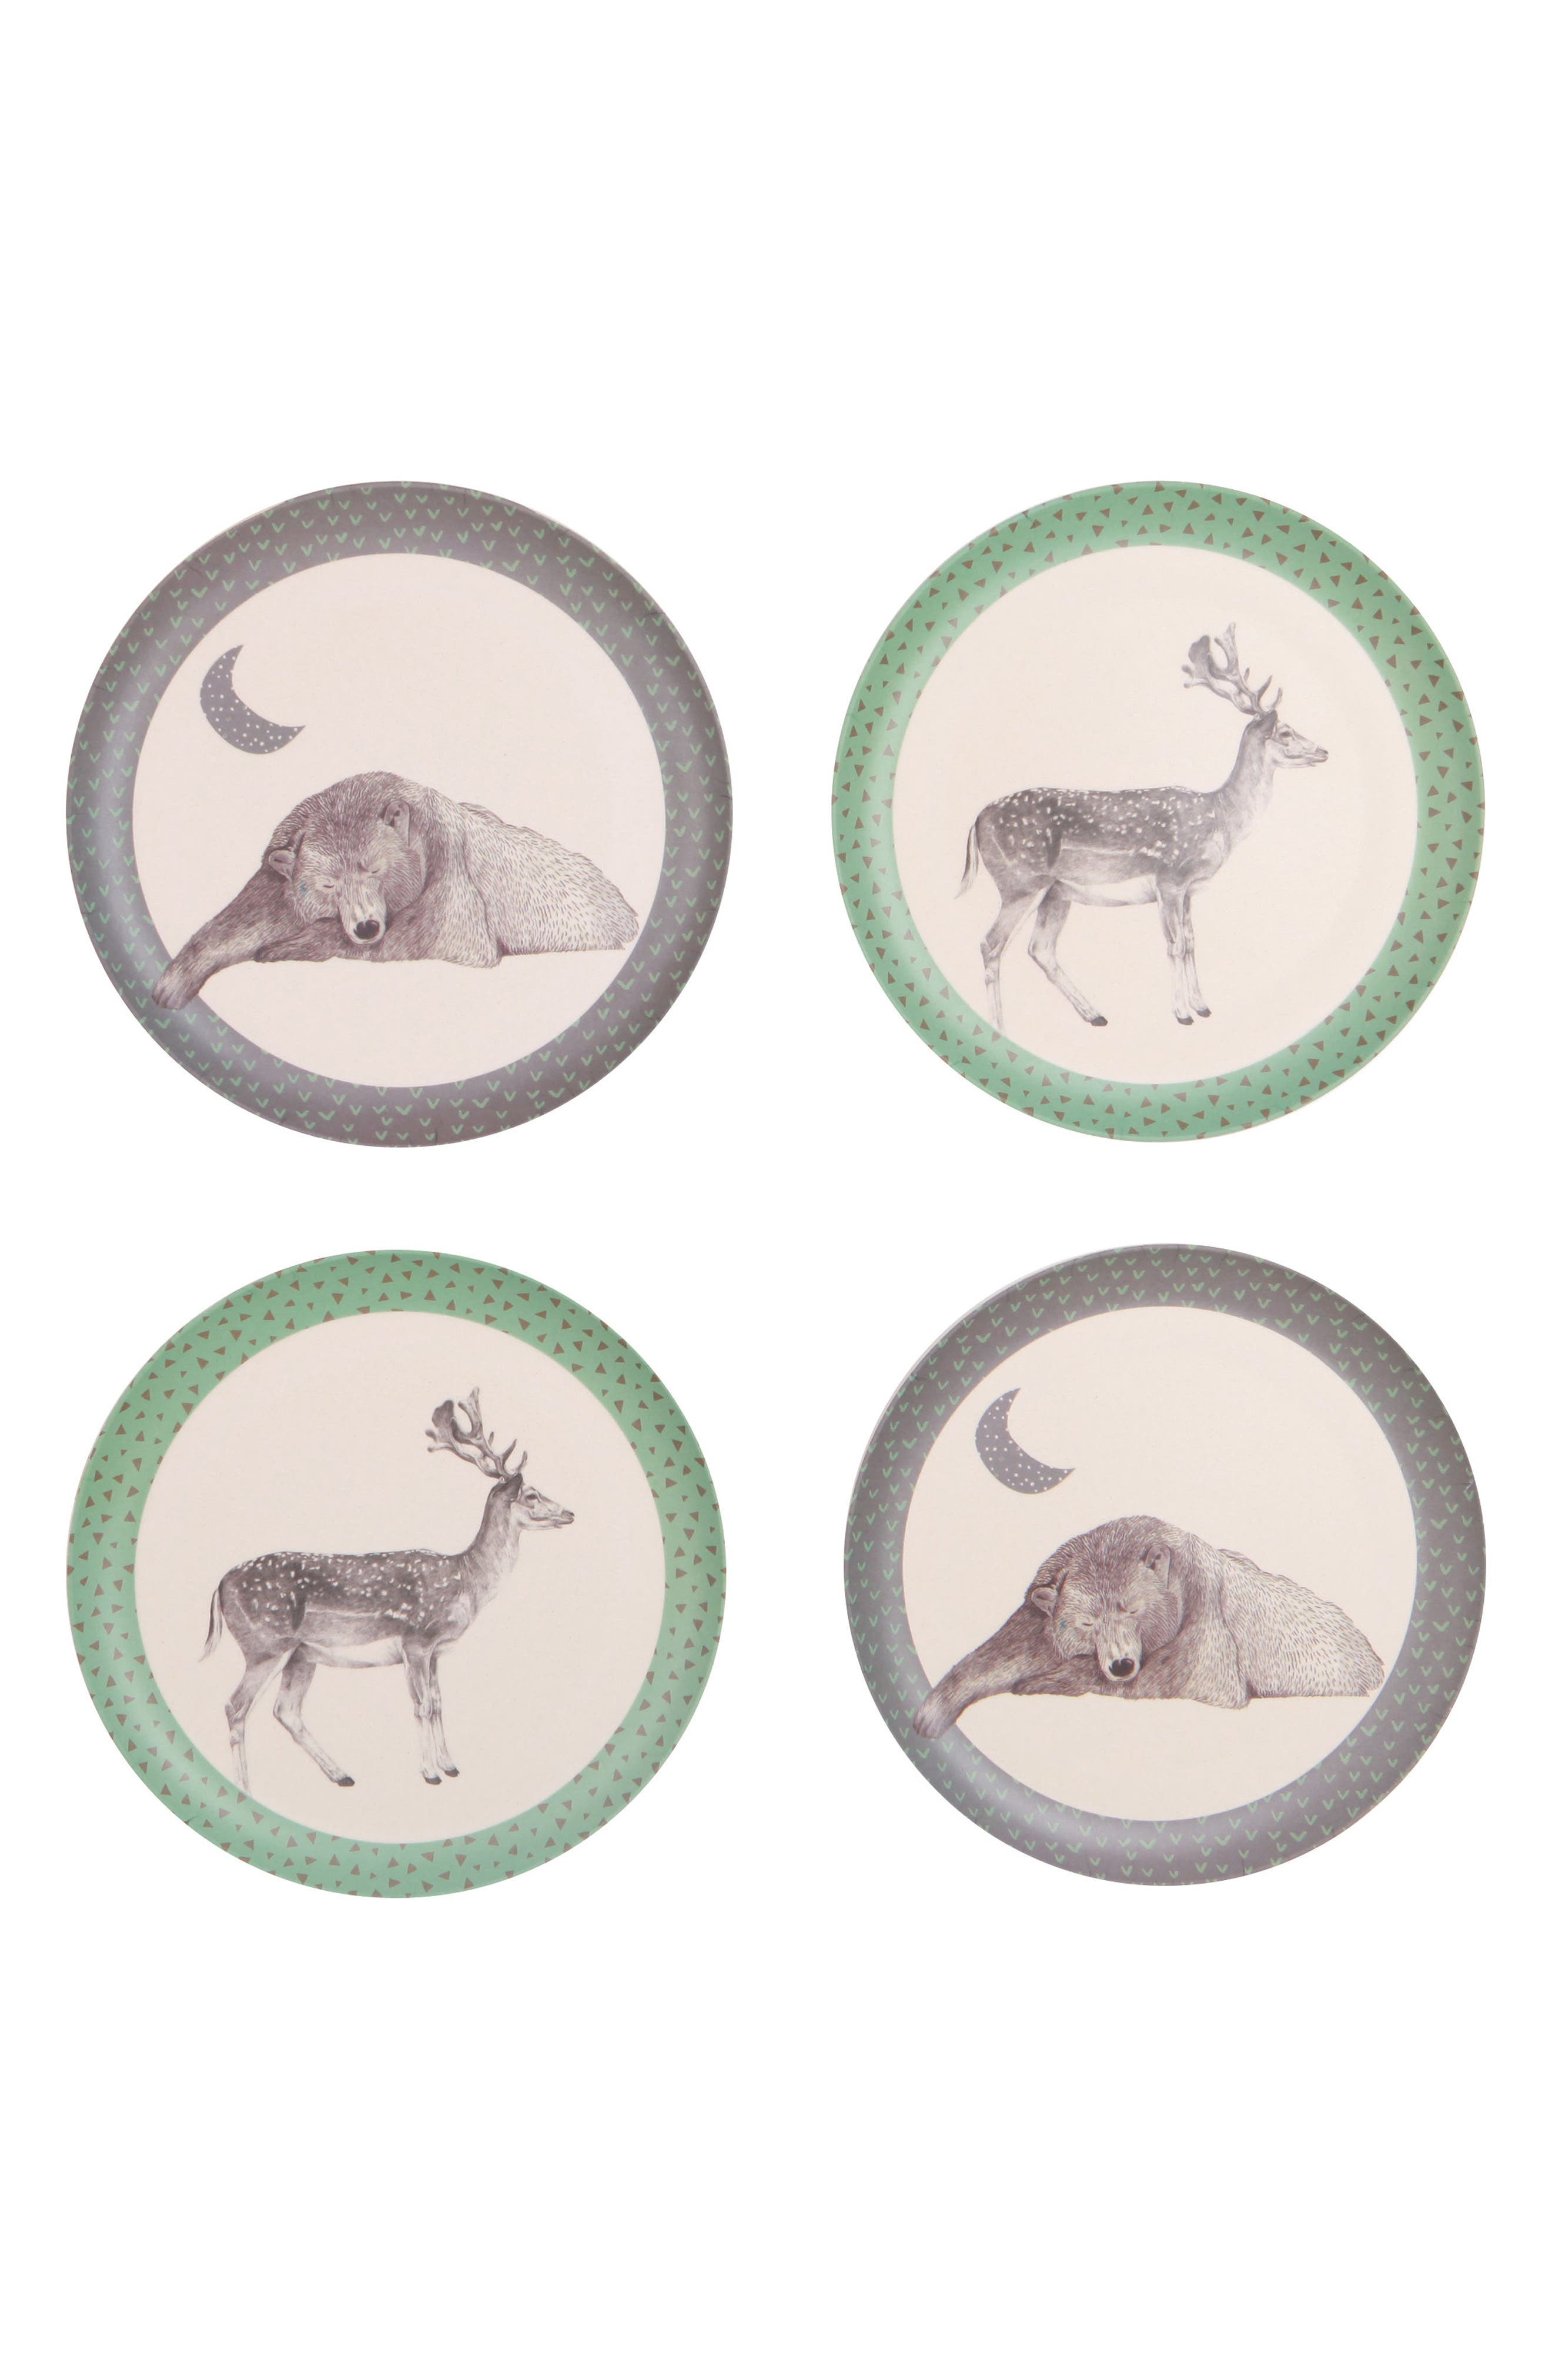 4-Pack Plates,                             Main thumbnail 1, color,                             Bear And Deer